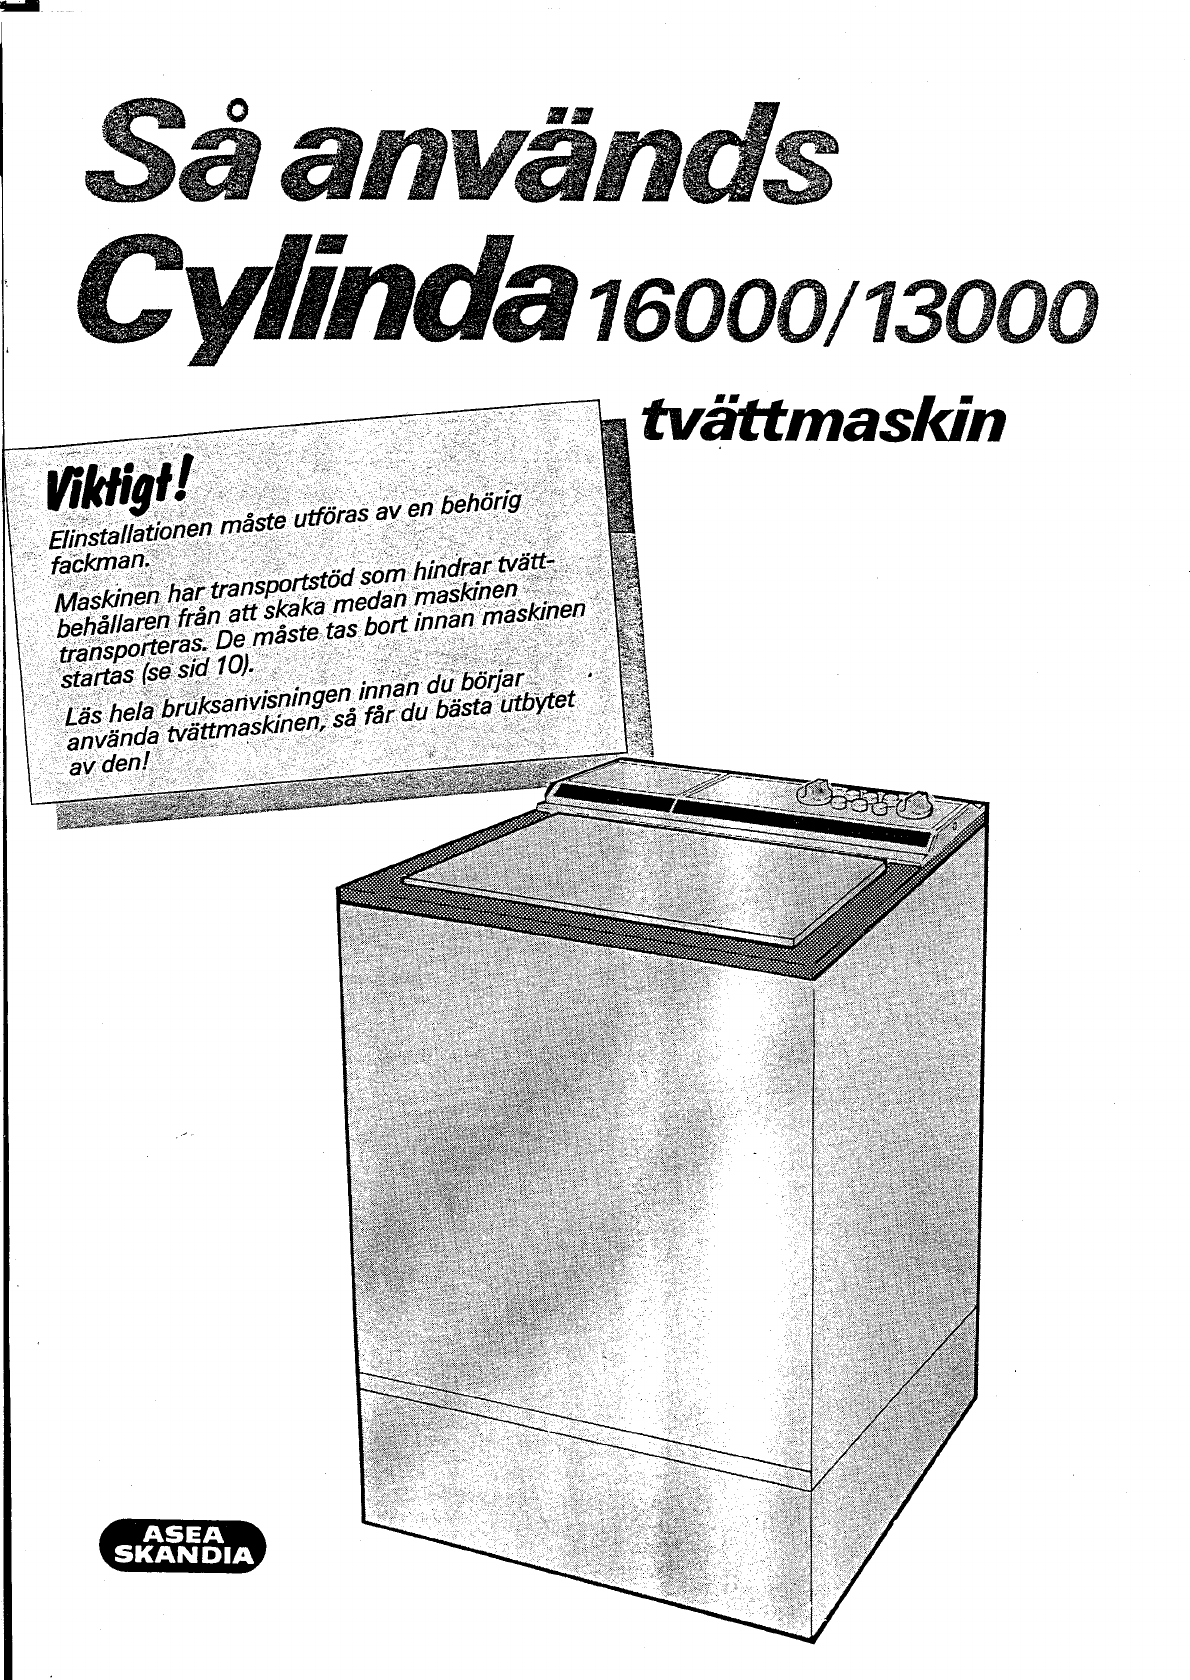 Cylinda asea skandia